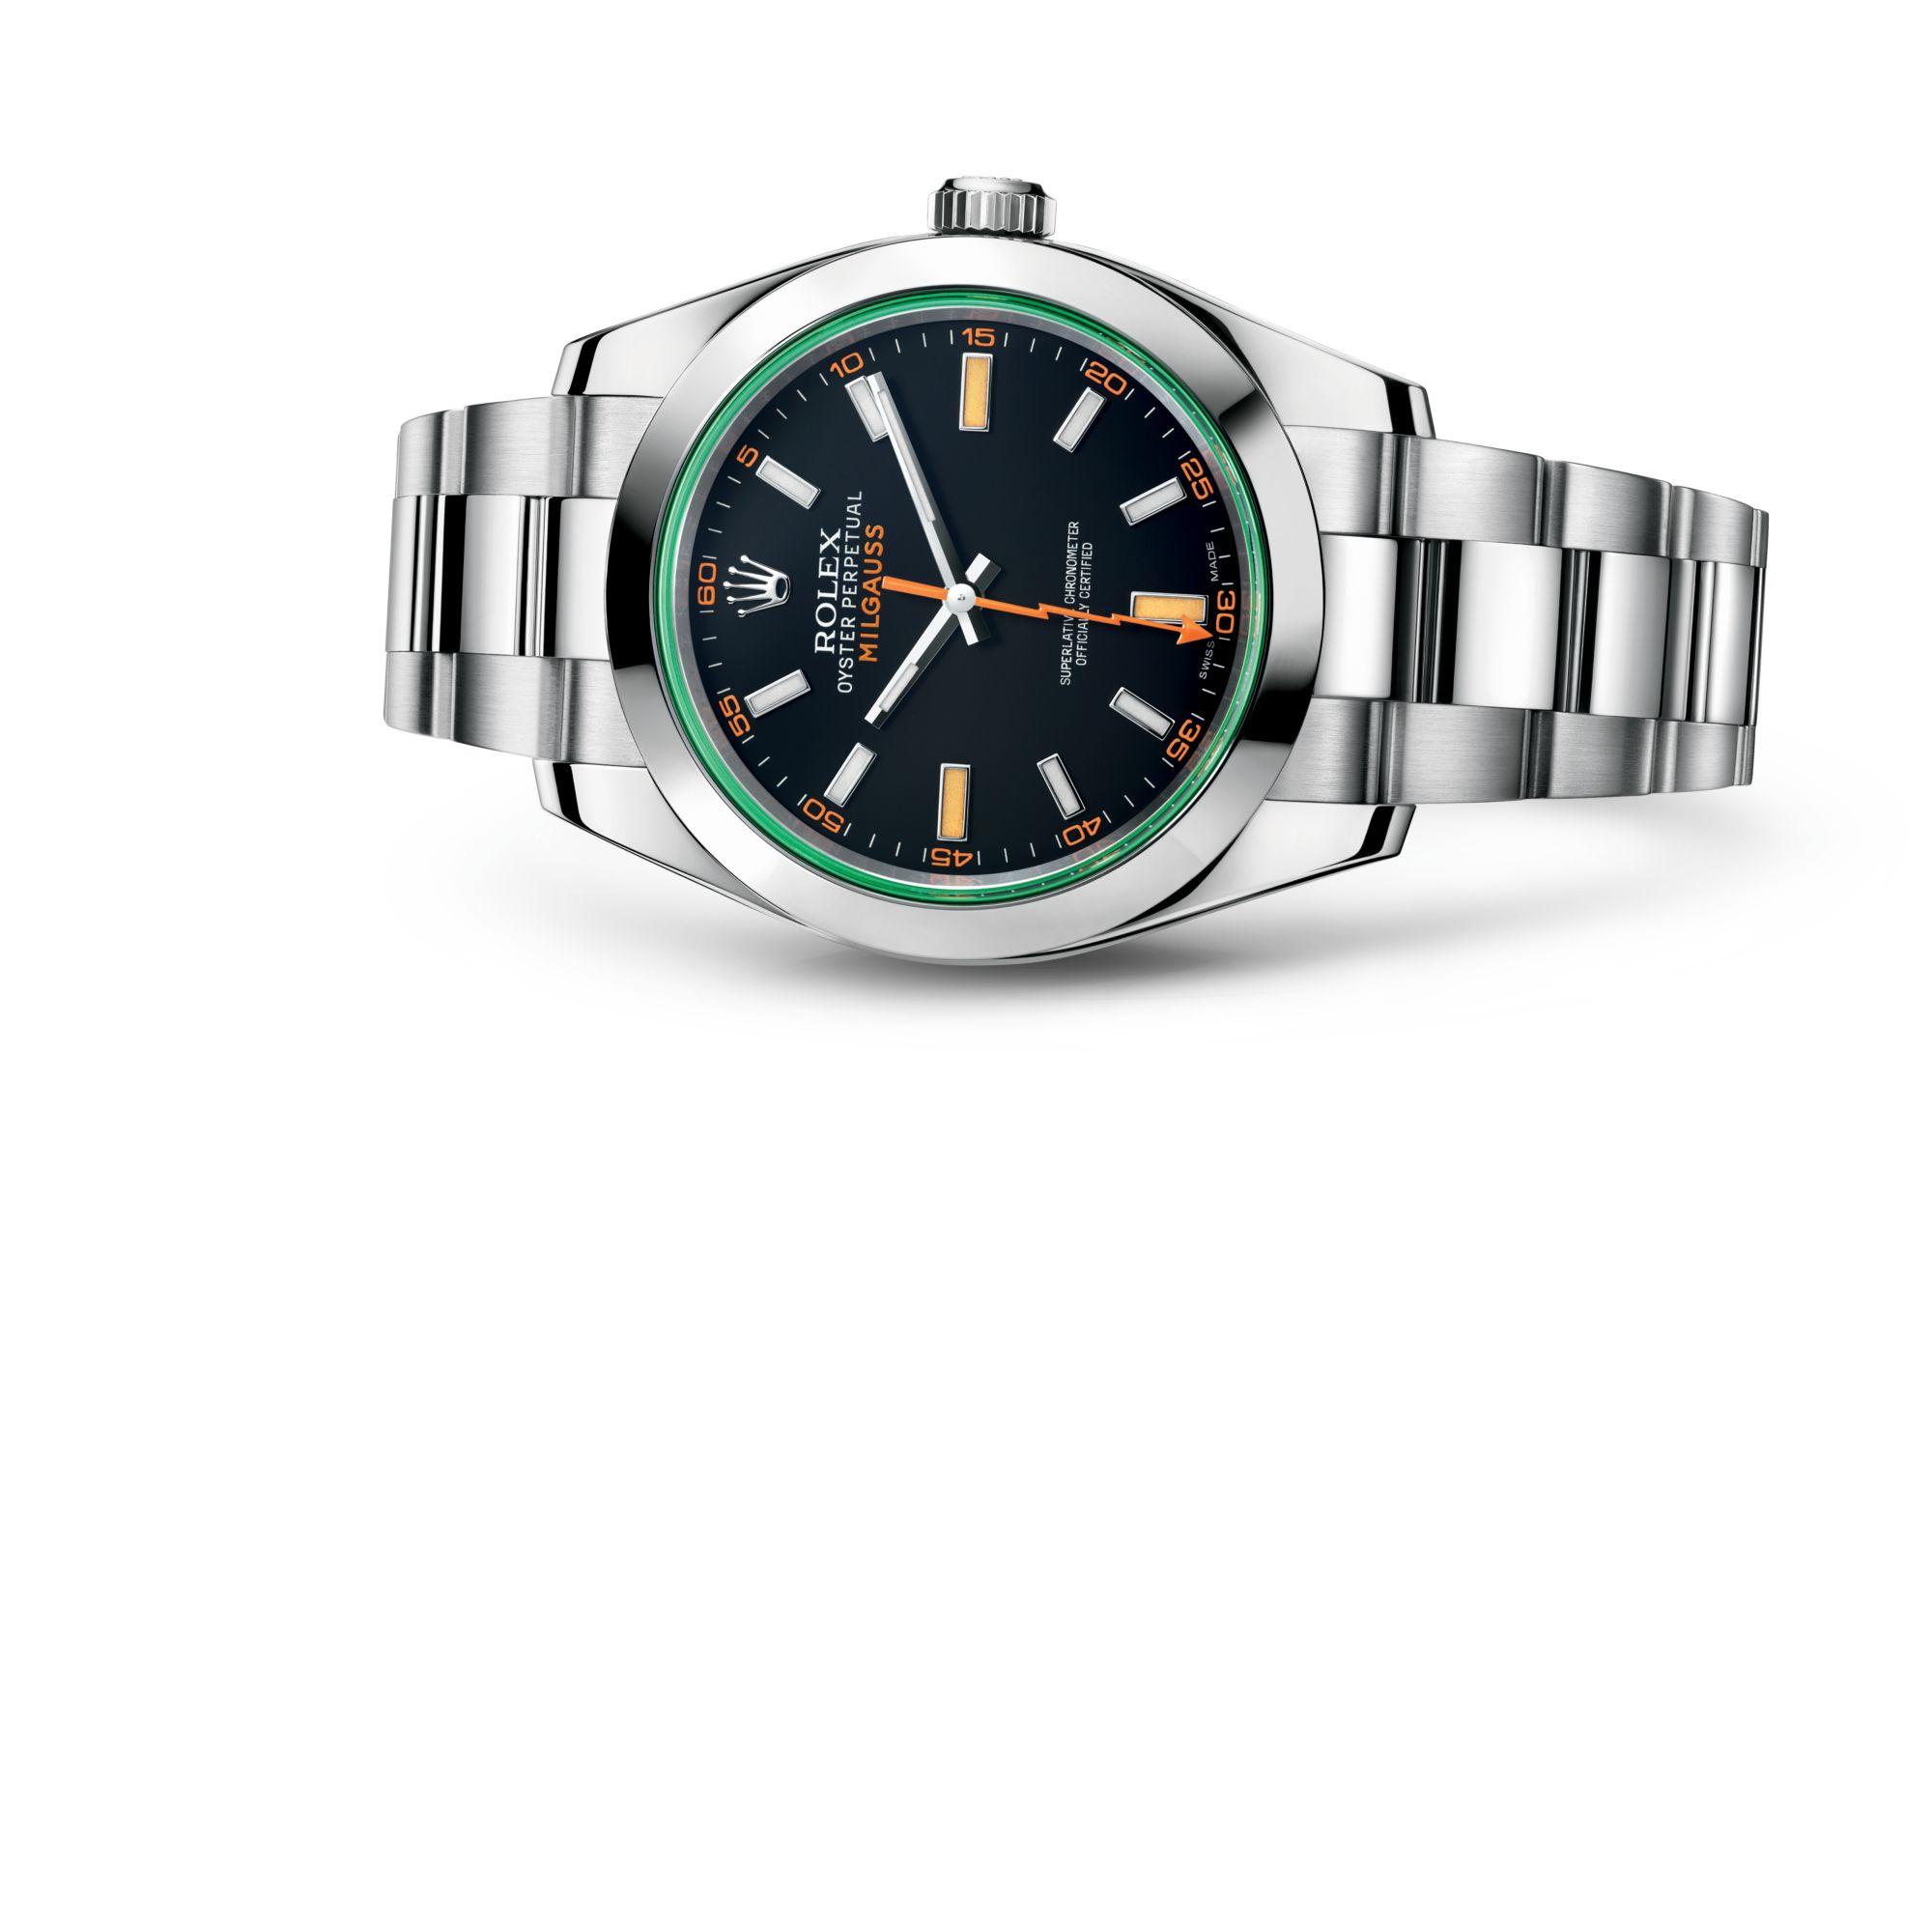 Rolex Milgauss M116400GV-0001